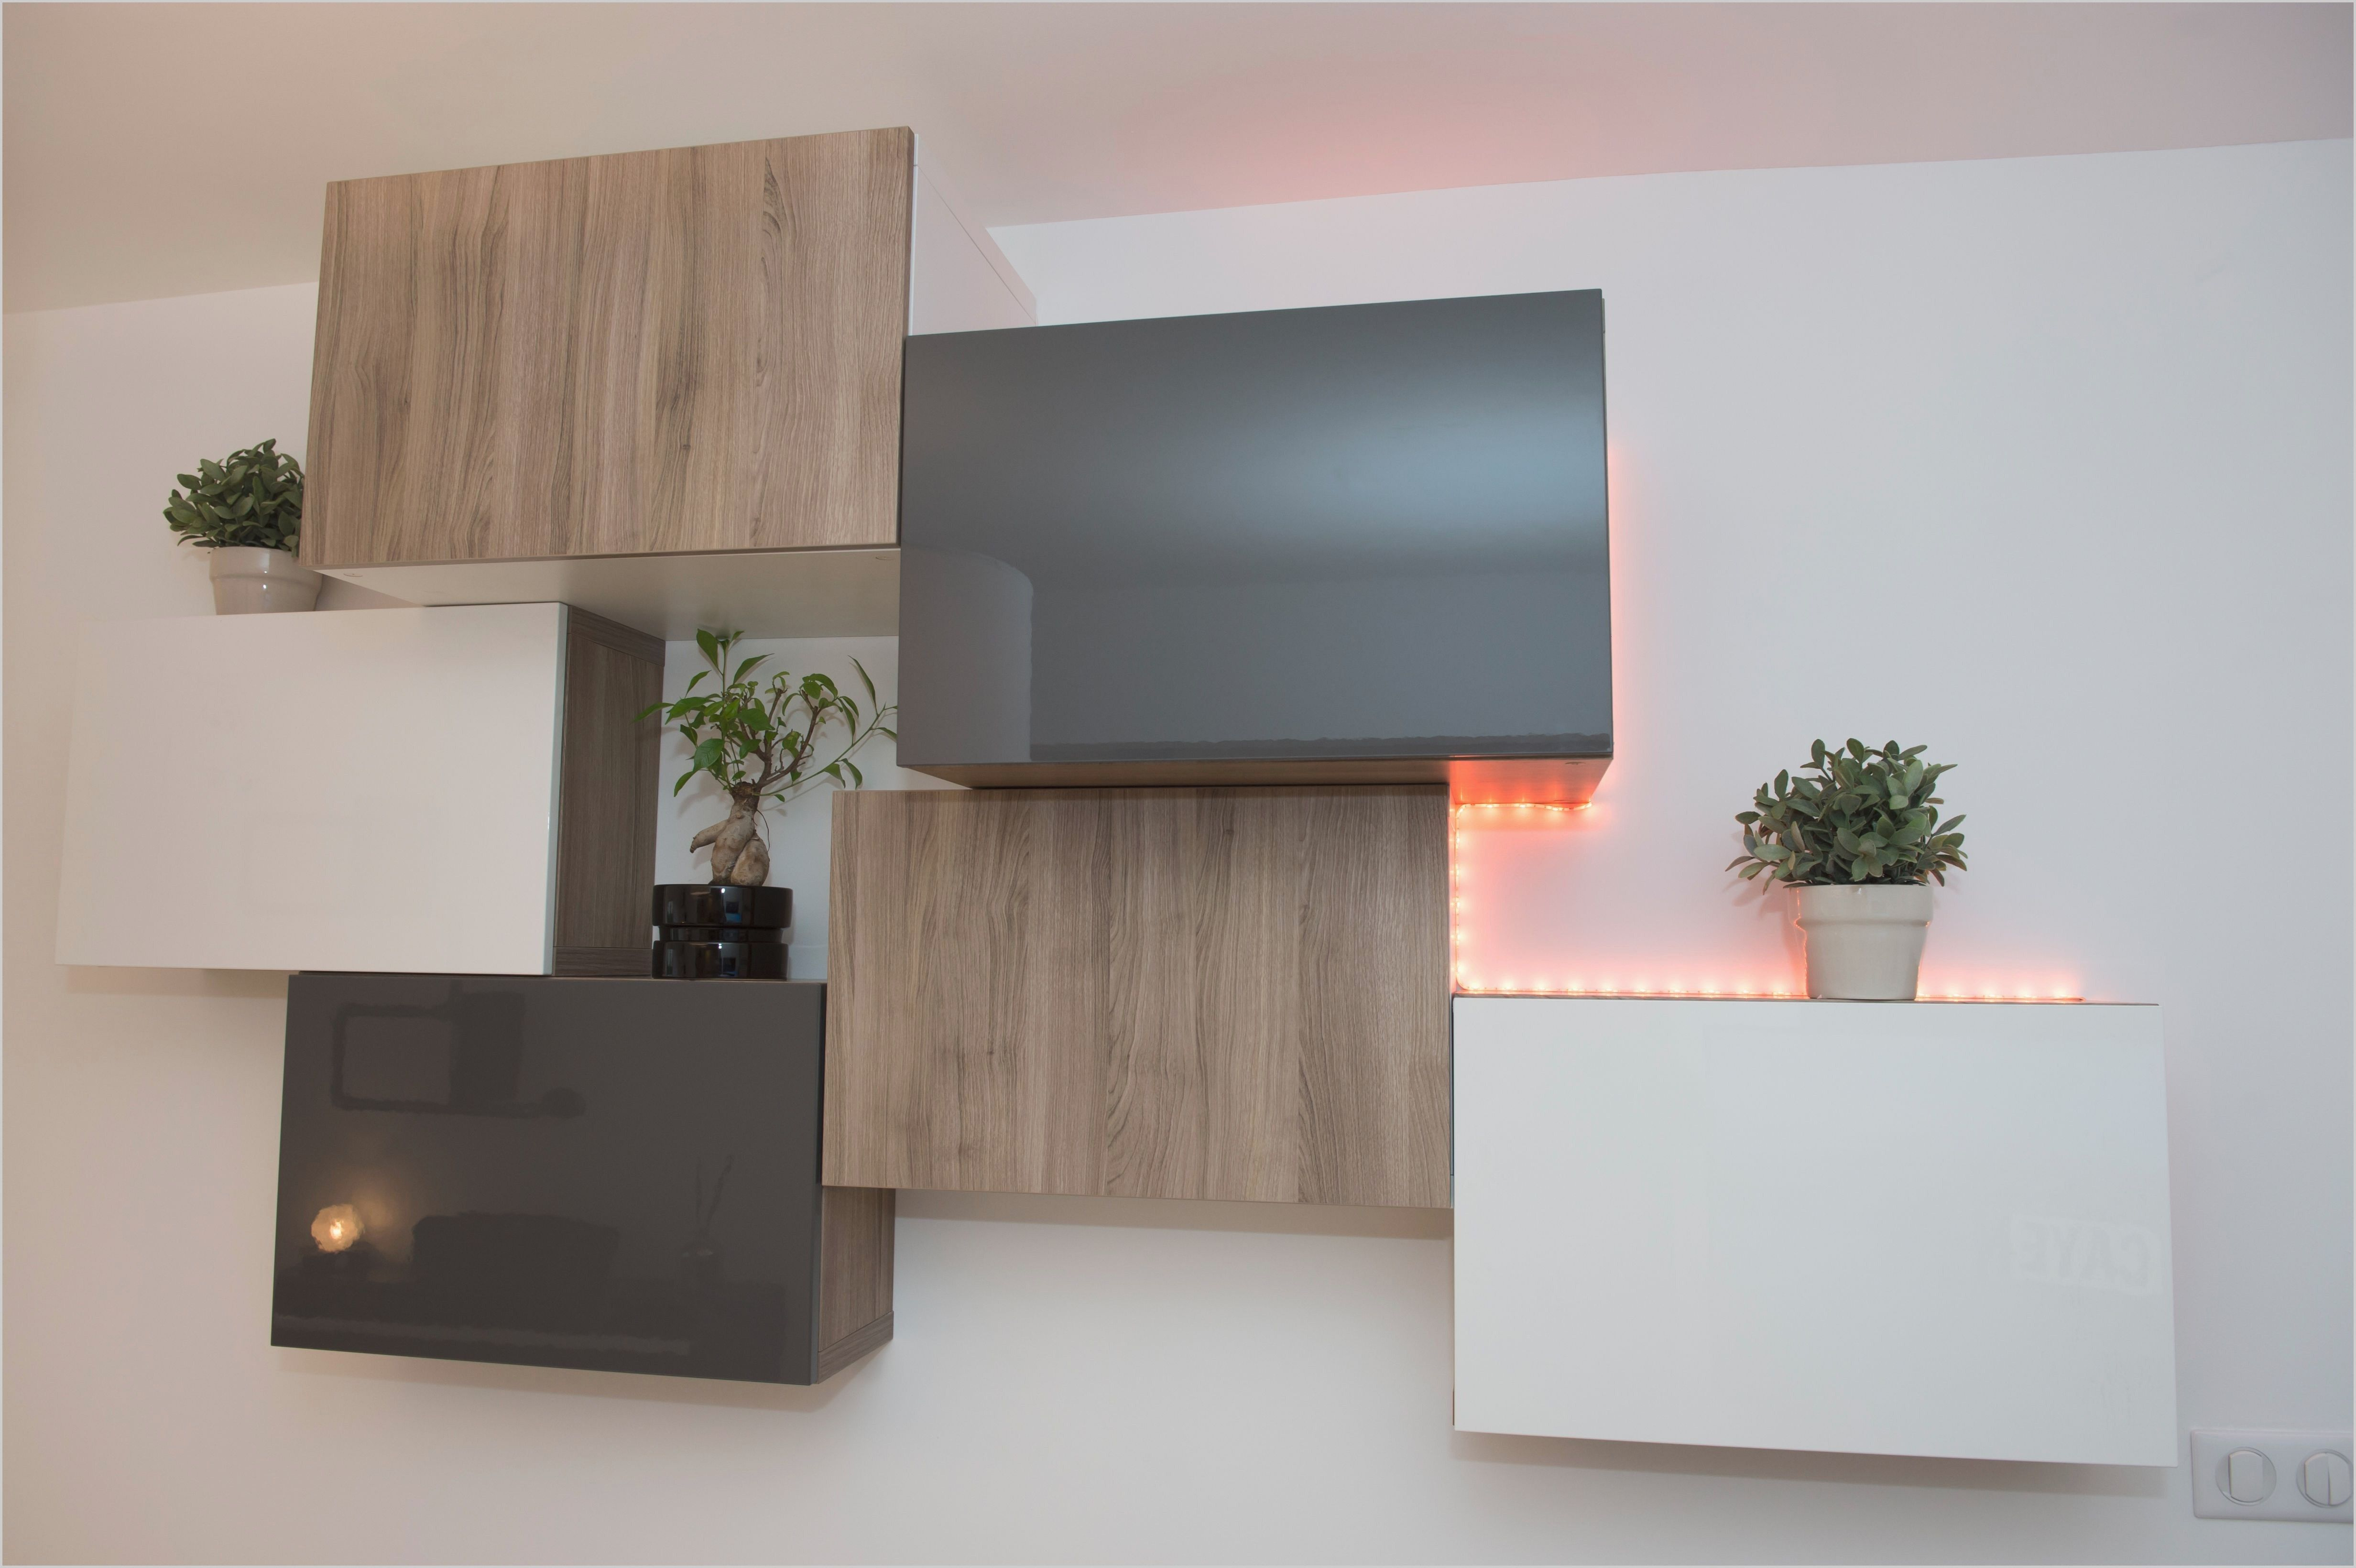 Cuisine Fixer Haut Ikea Meilleur Meuble Meilleur Fixer Meuble Haut Cuisine Ikea Fixer Meuble Haut Cuisine Ikea Fixer Meuble Haut C In 2020 Living Room Tv Ikea Living Room Home